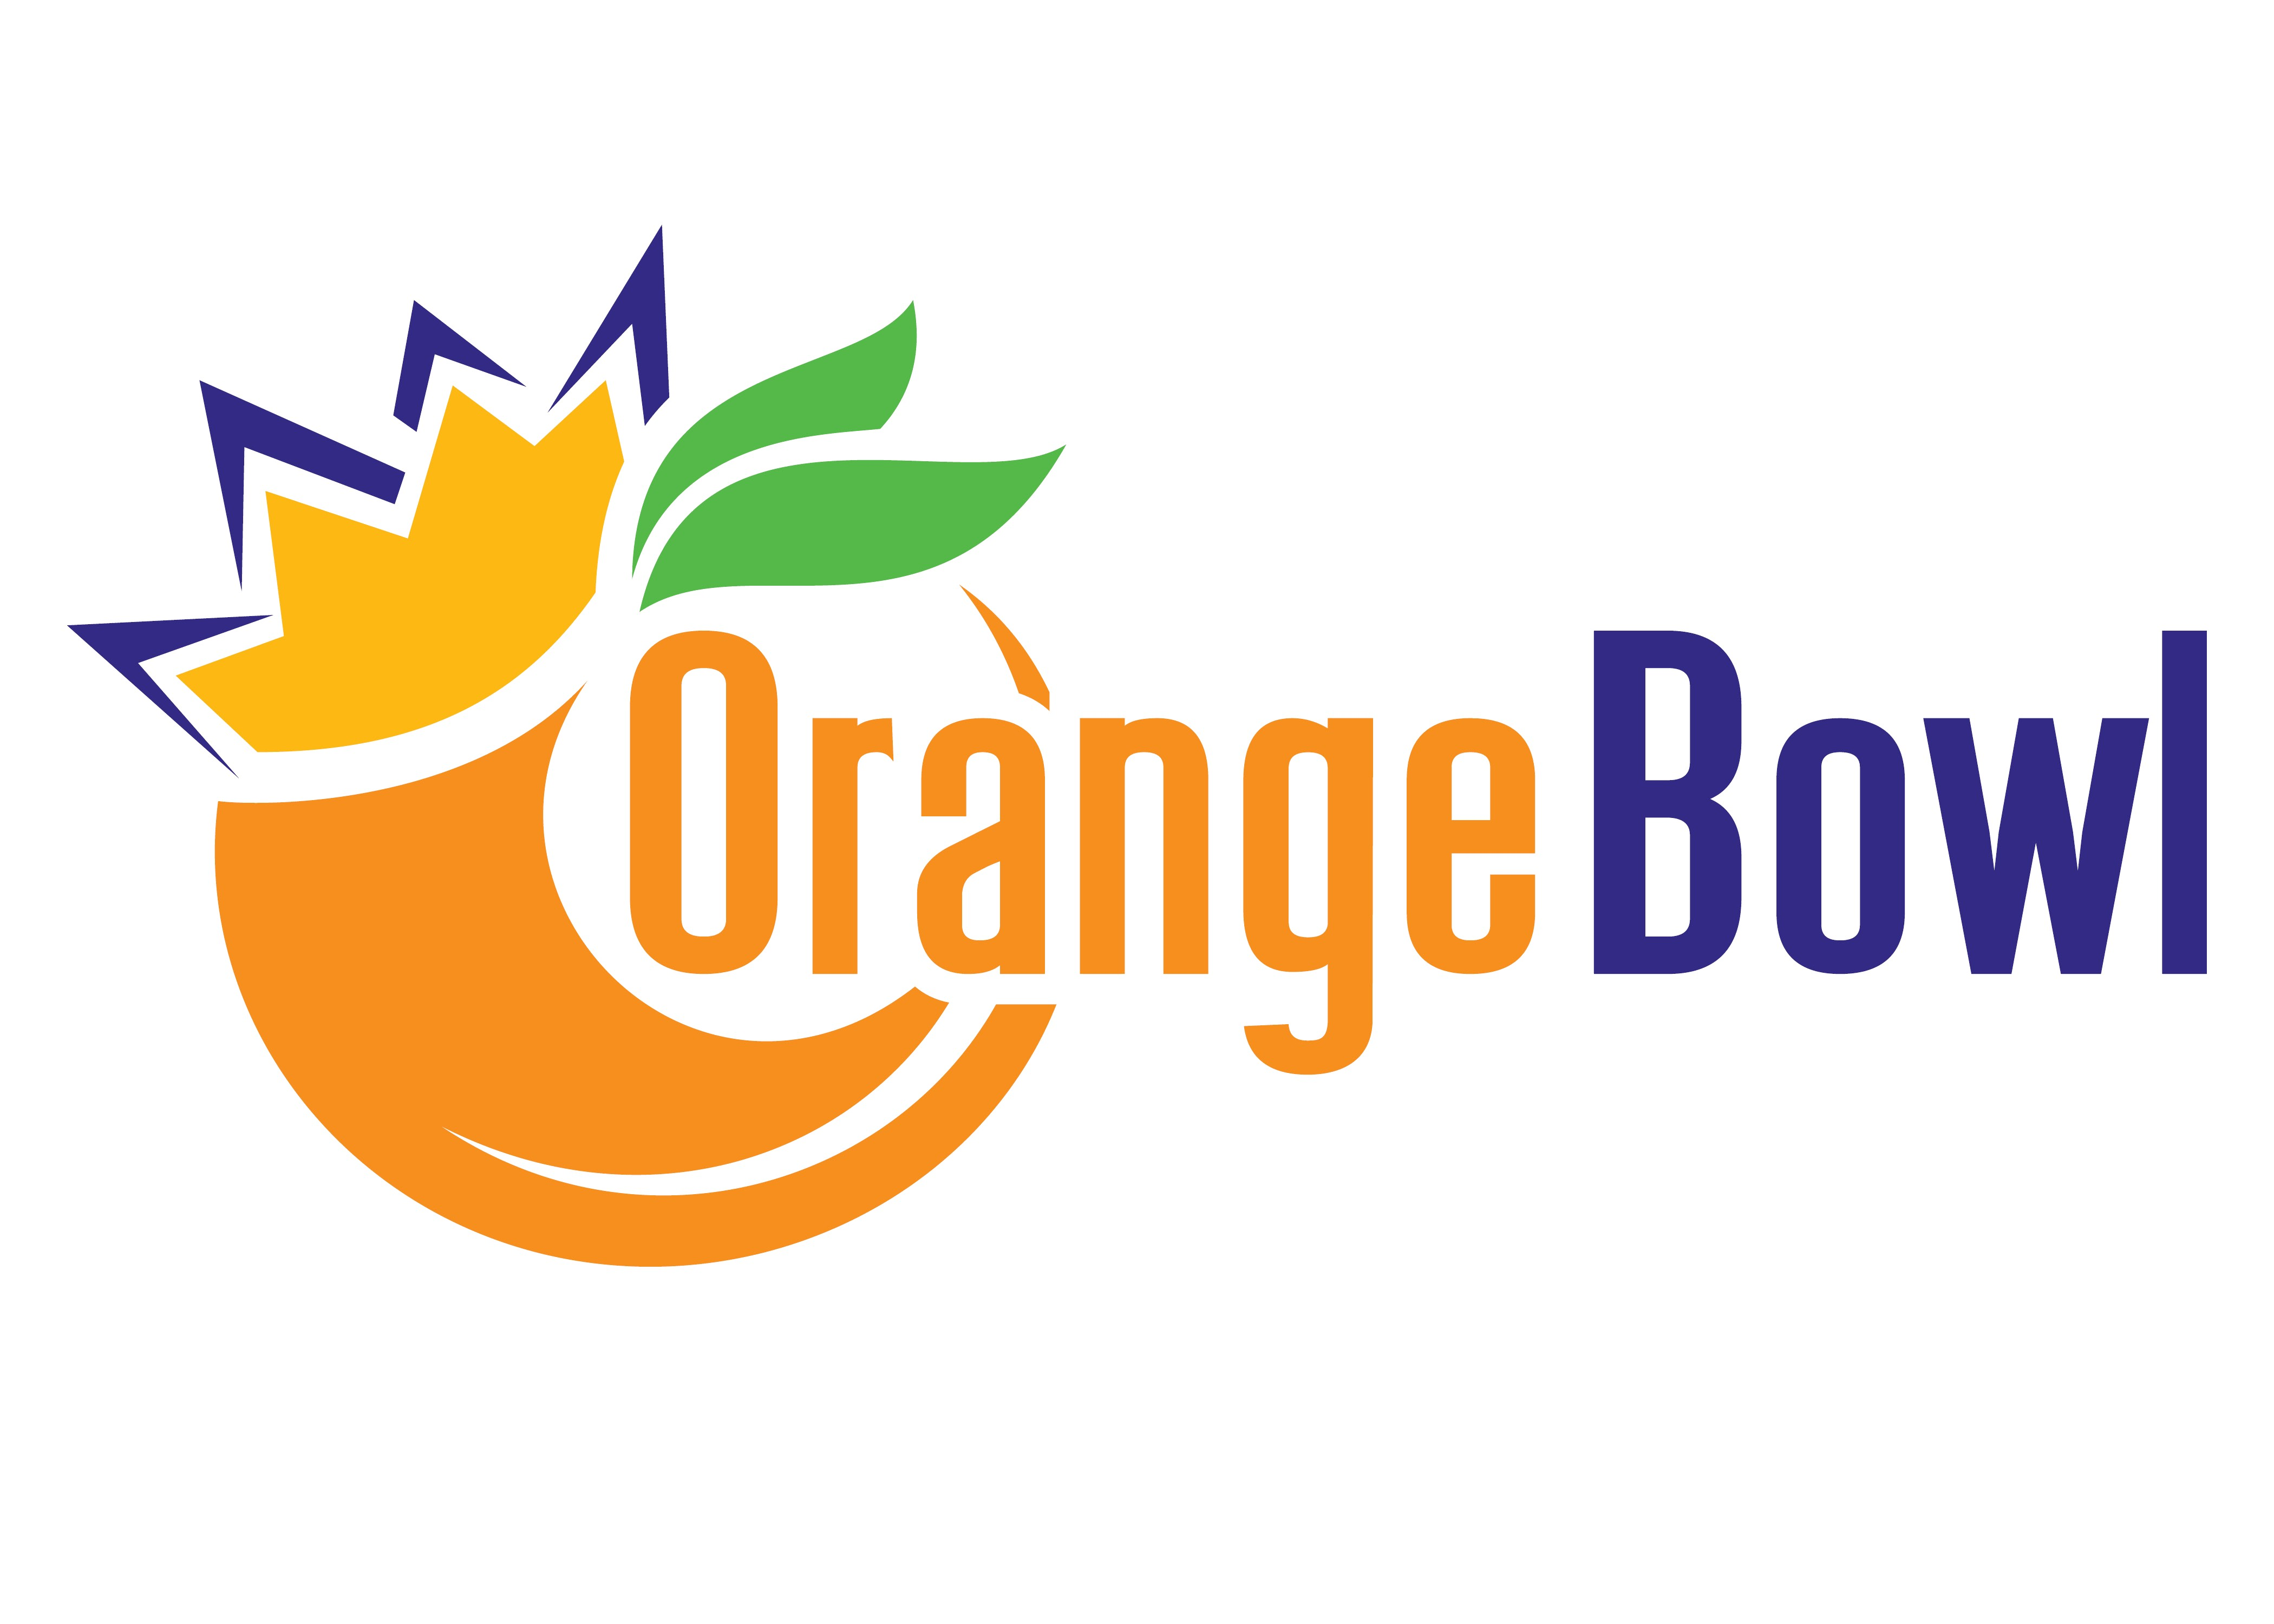 Calendario 2019 atp Actual Junior orange Bowl What We Do Sports Tennis Of Calendario 2019 atp Más Recientemente Liberado atp Challenger tour atp tour